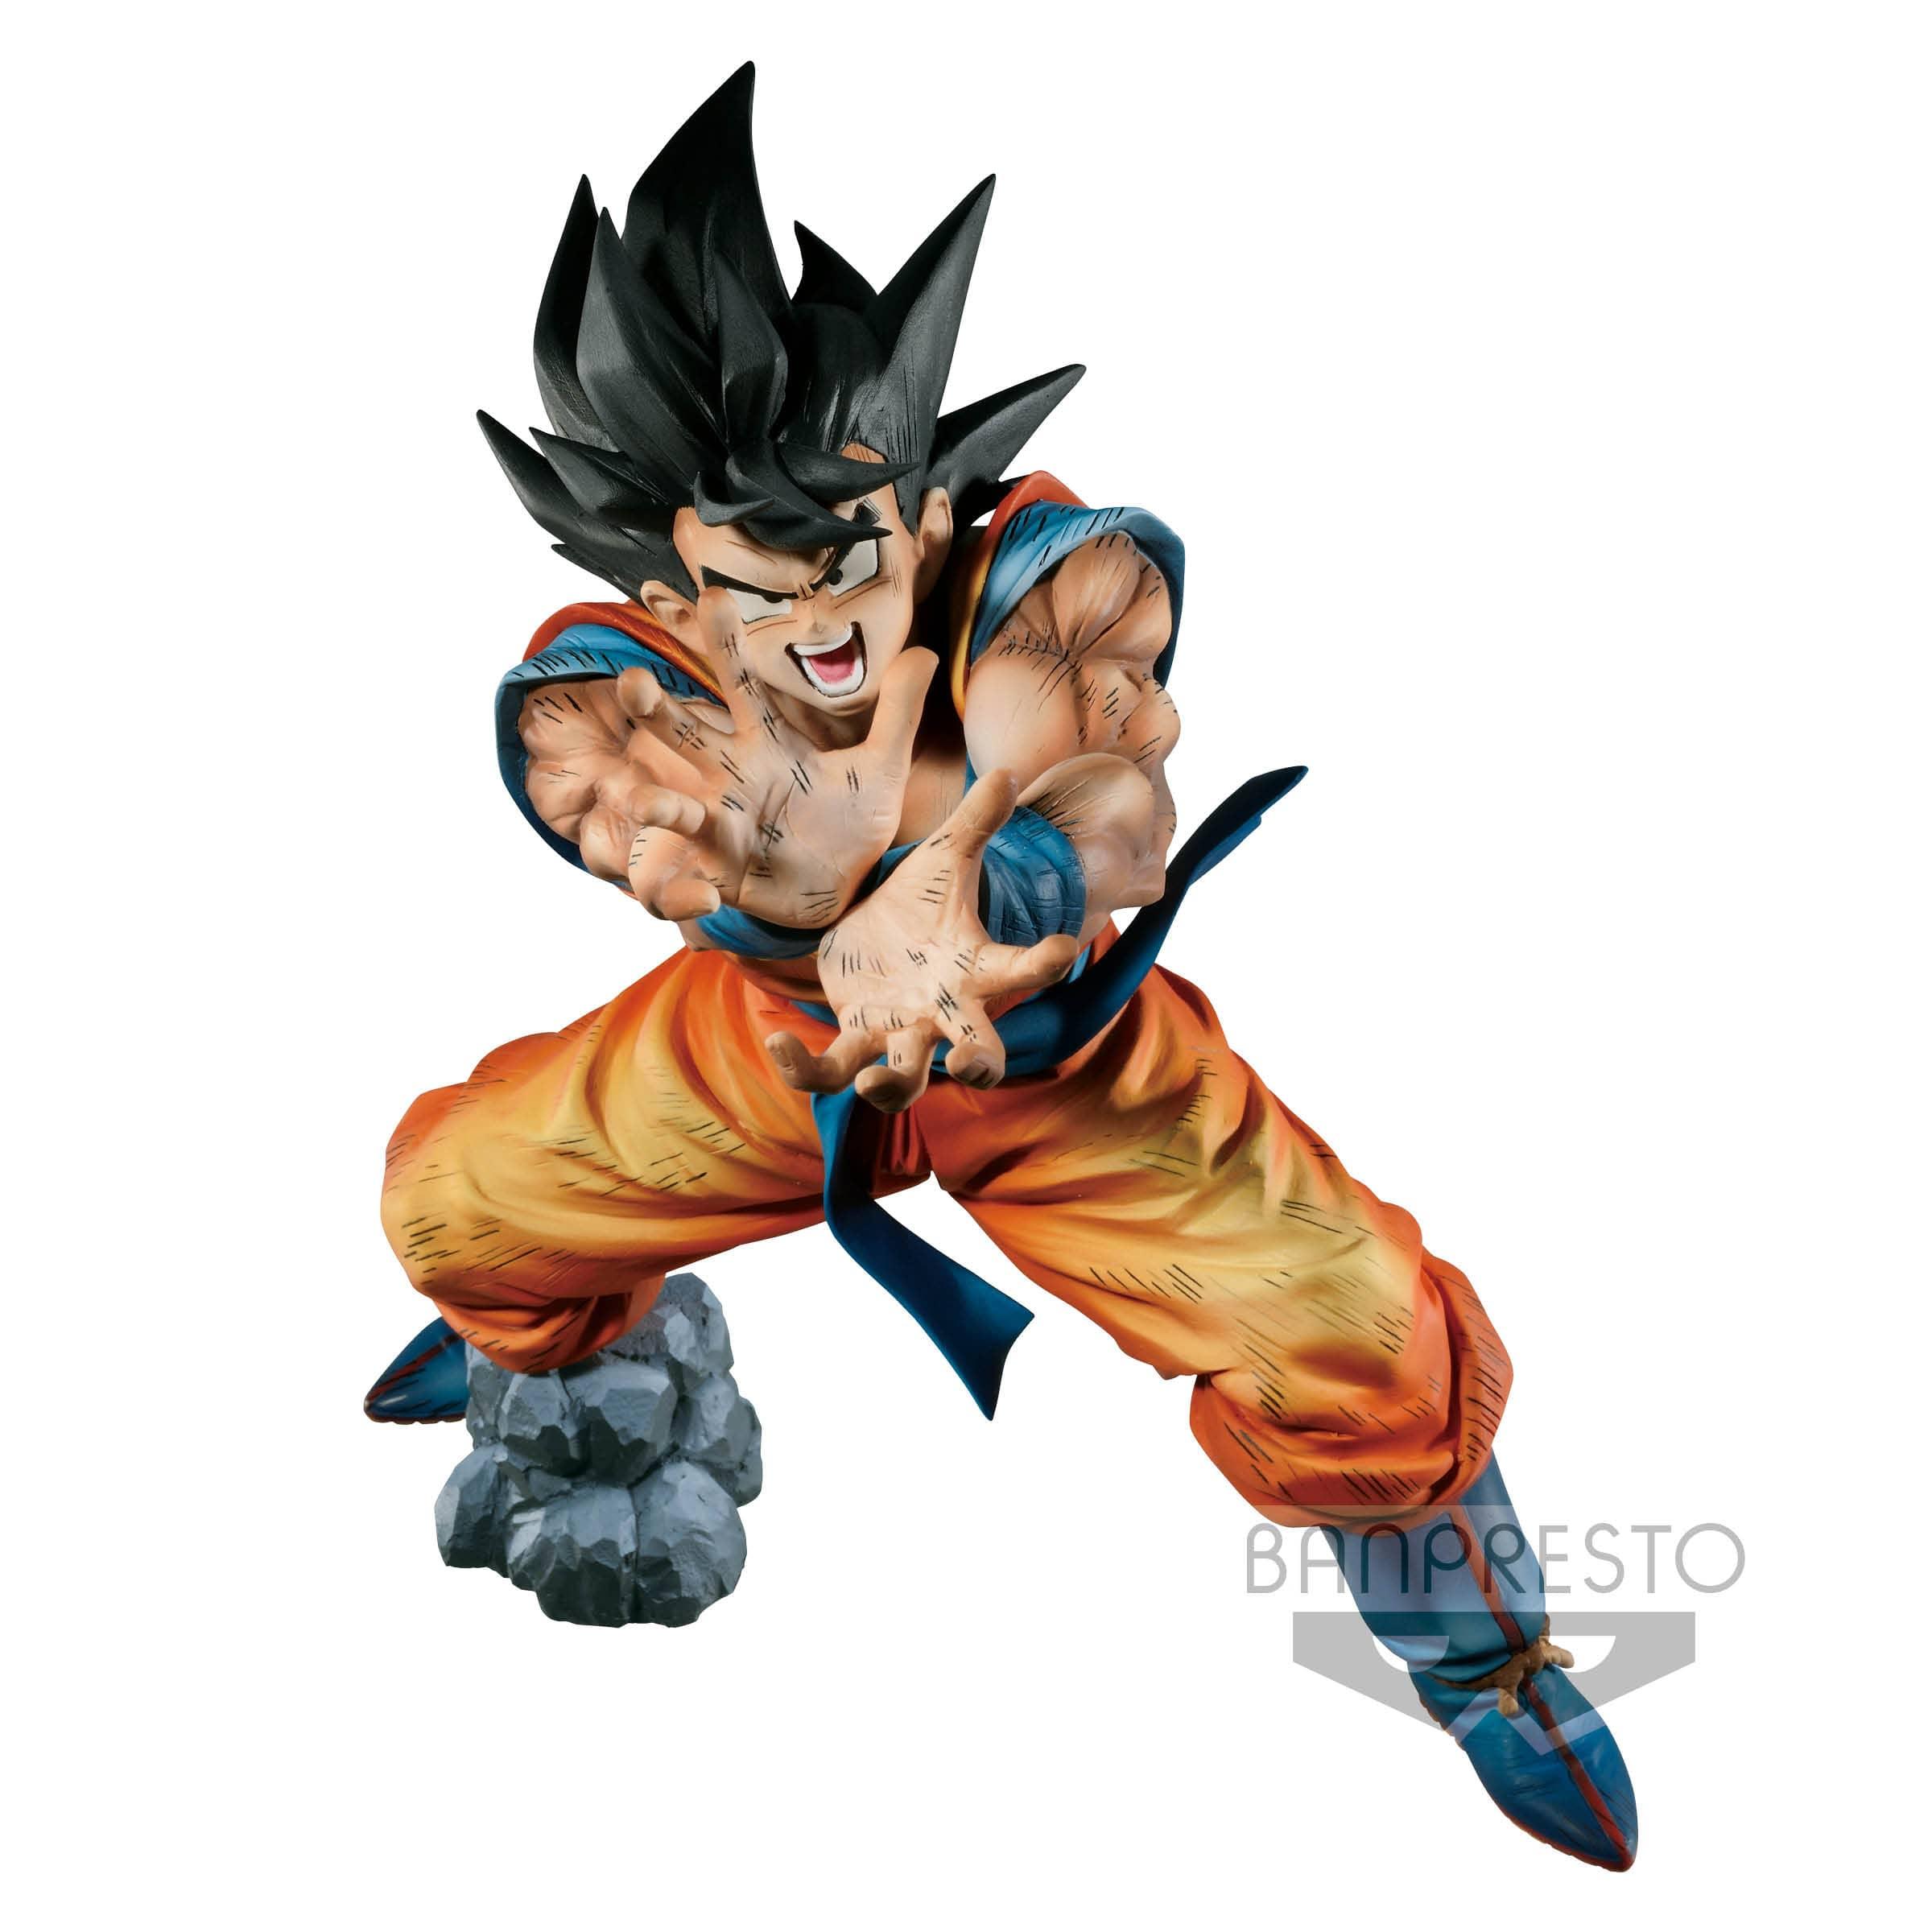 SON GOKU SUPER KAMEHAME-HA PREMIUM COLOR EDITION FIGURA 20 CM DRAGON BALL